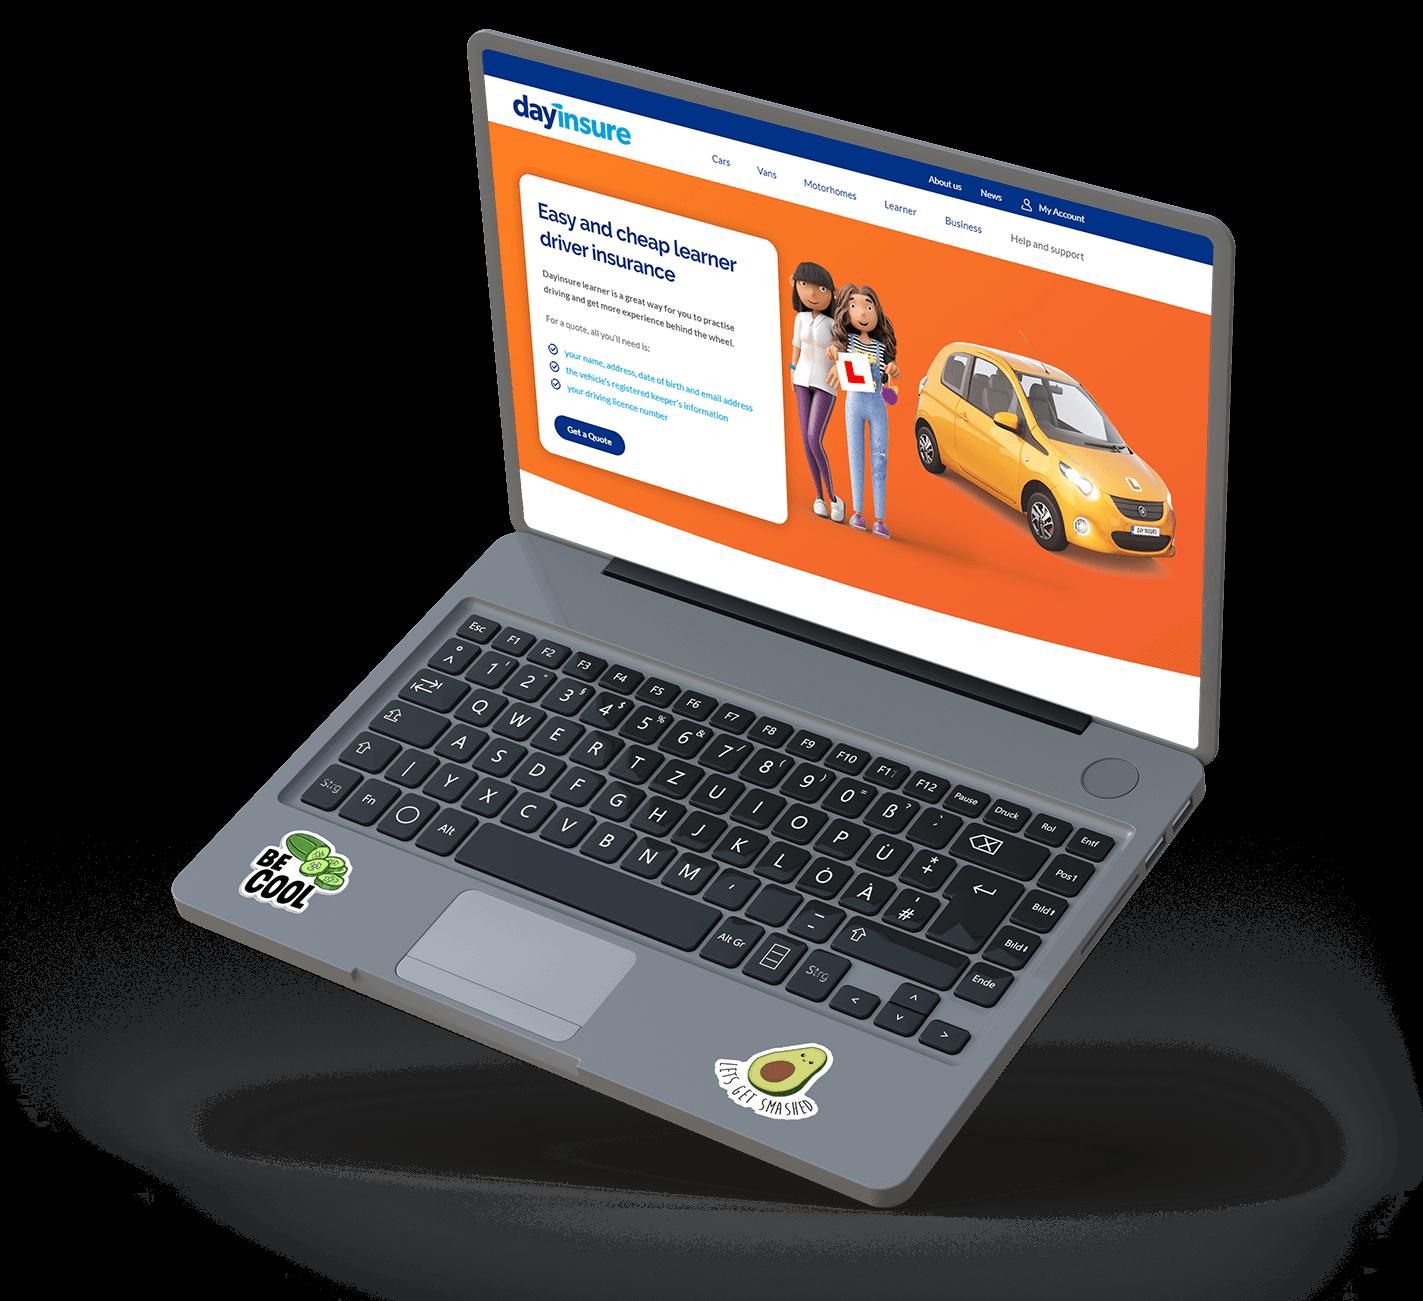 Dayinsure Learner Insurance on Laptop